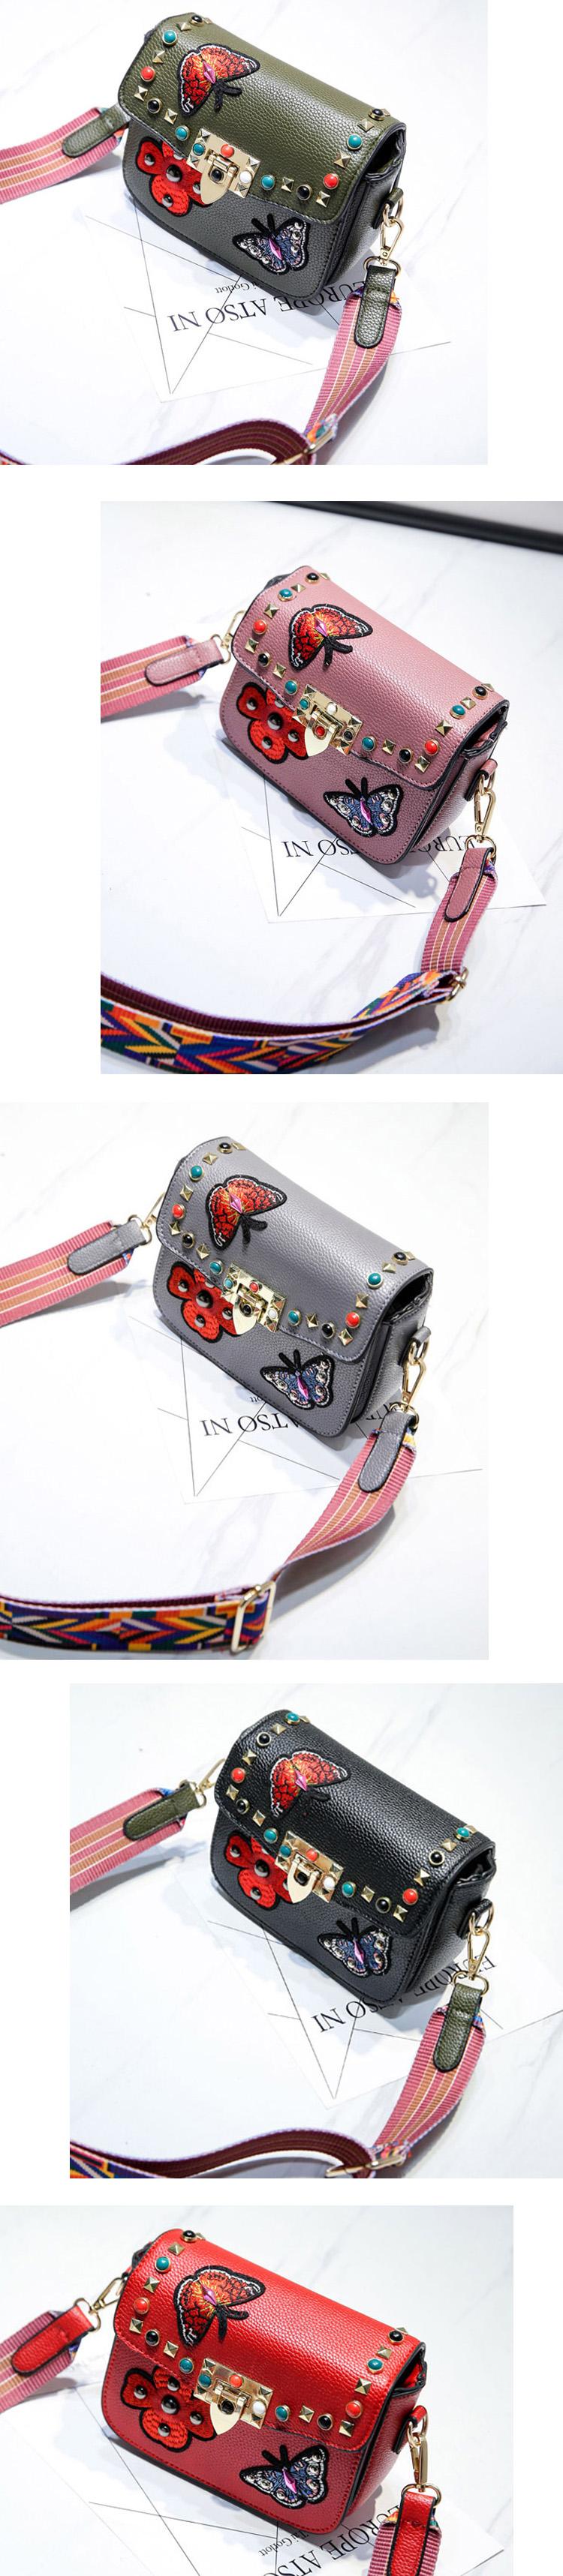 SAJOSE Women Small Hand Bag Flowers Designer Leather Shoulder Woman's Fashion Messenger Lady Crossbody Luxury Handbag Women Bags 3